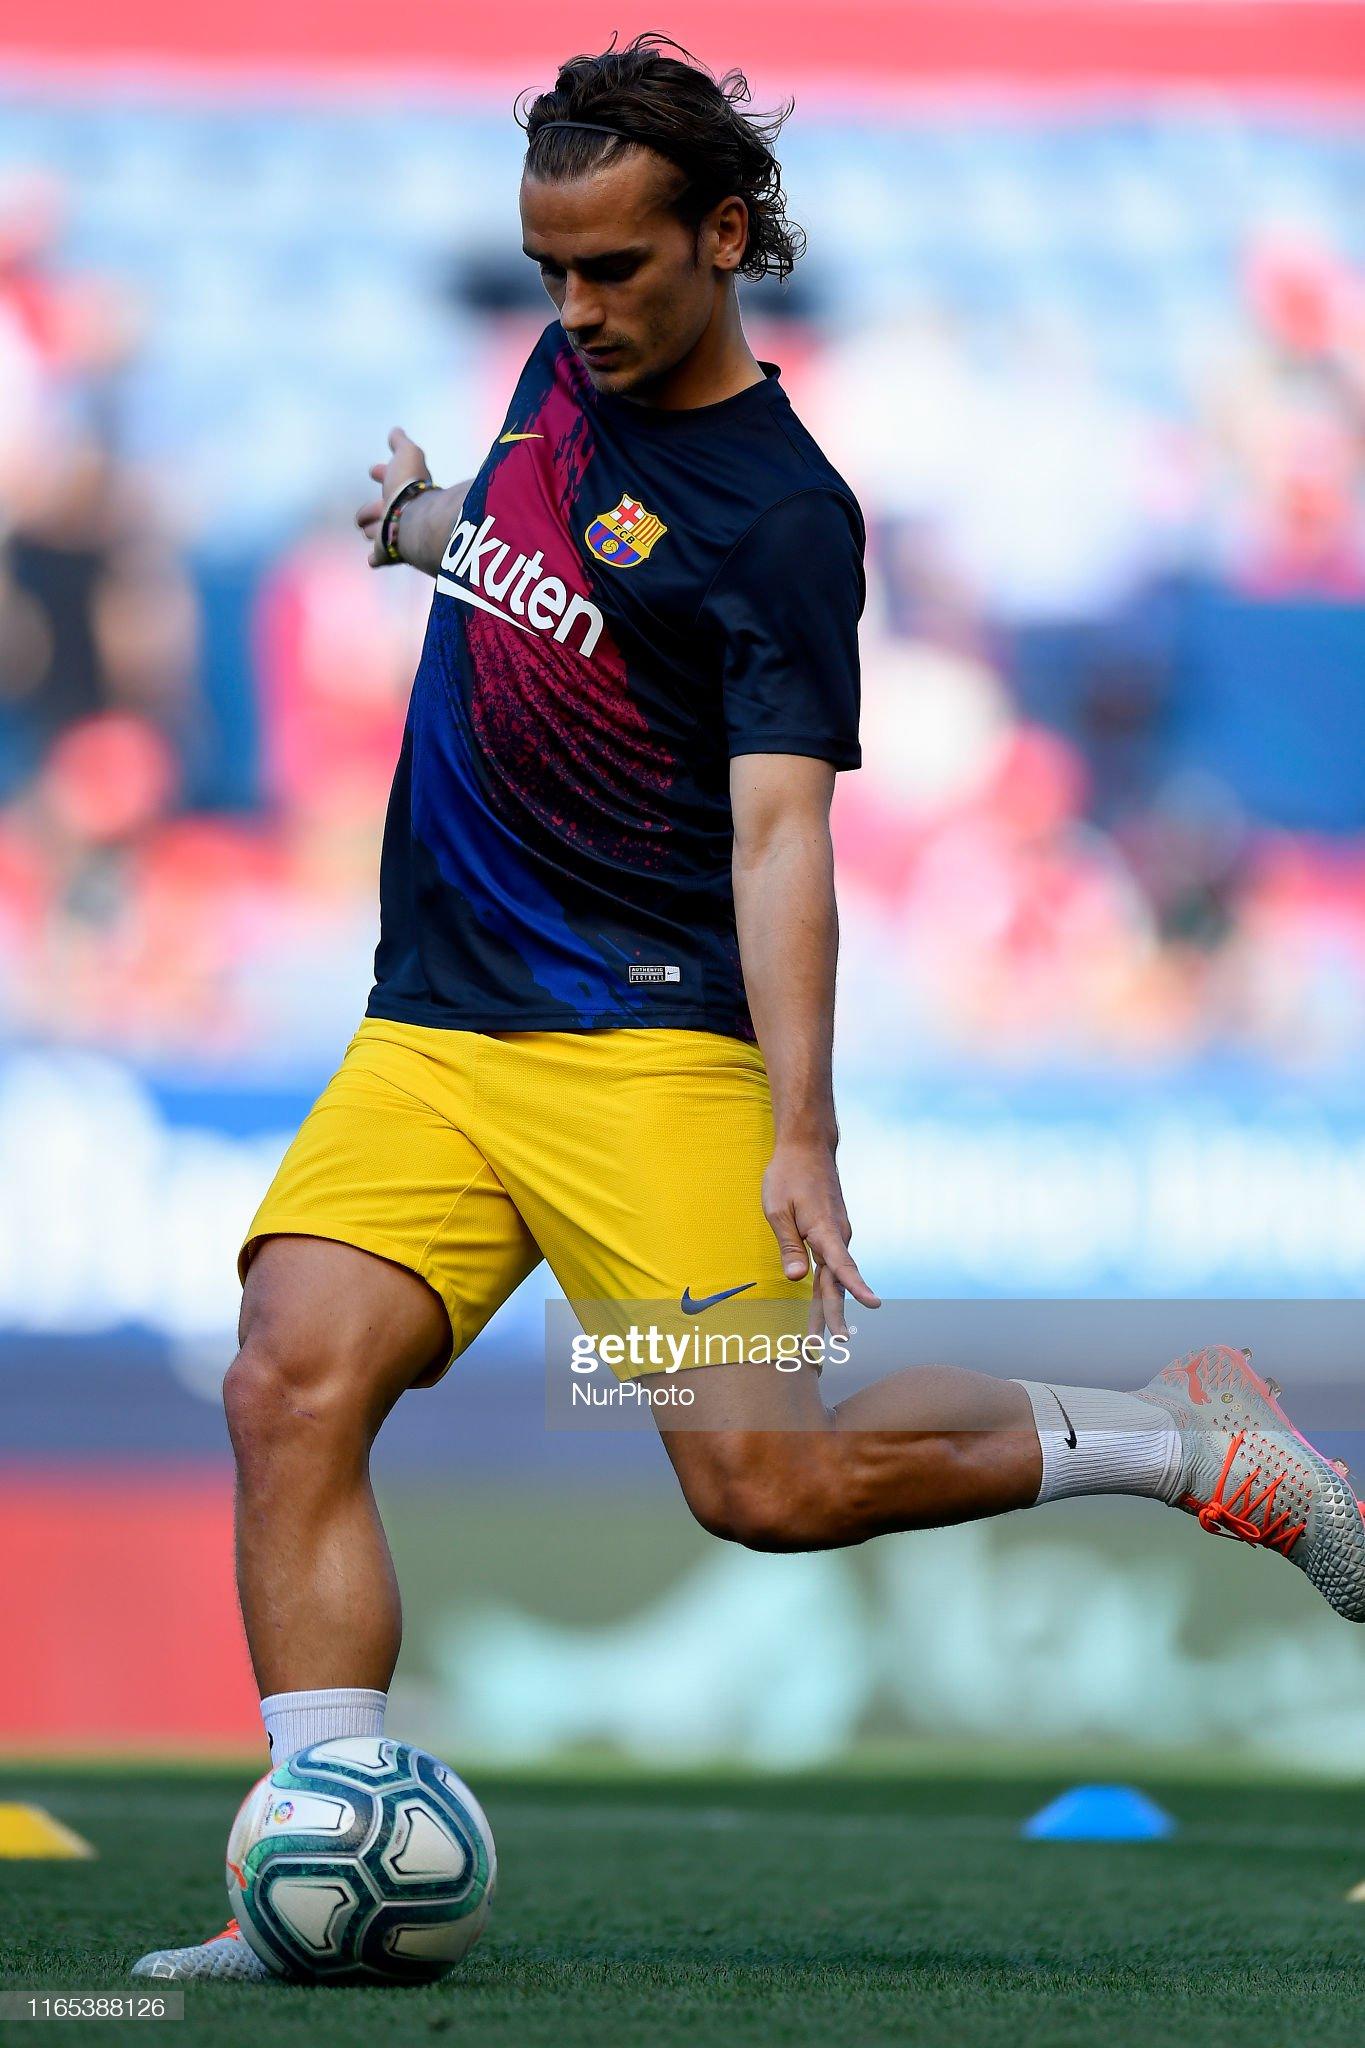 صور مباراة : أوساسونا - برشلونة 2-2 ( 31-08-2019 )  Antoine-griezmann-of-barcelona-during-the-warmup-before-the-liga-ca-picture-id1165388126?s=2048x2048